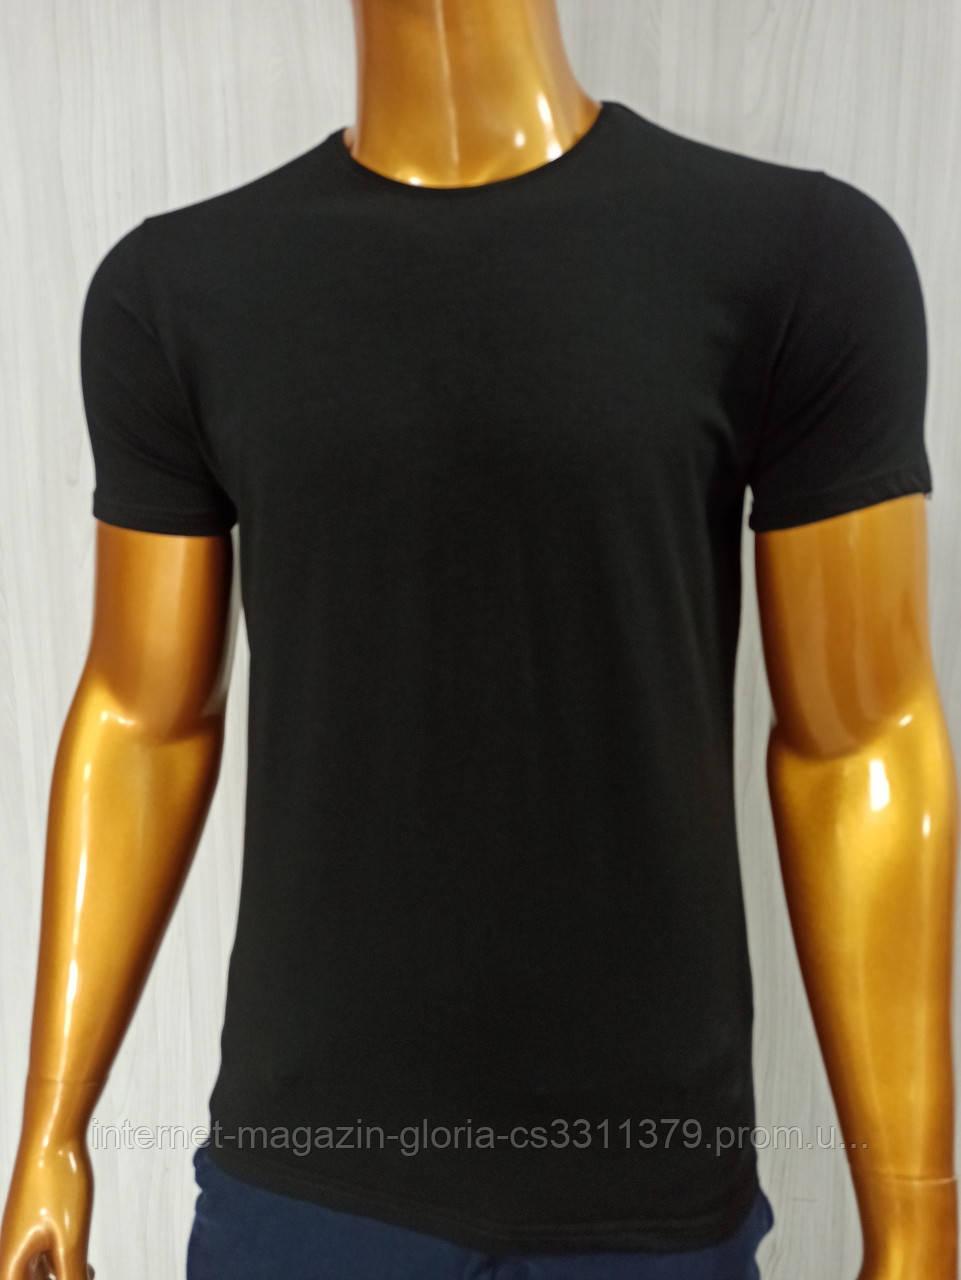 Мужская футболка MSY. 42636-8182(ч). Размеры: M,L,XL,XXL.